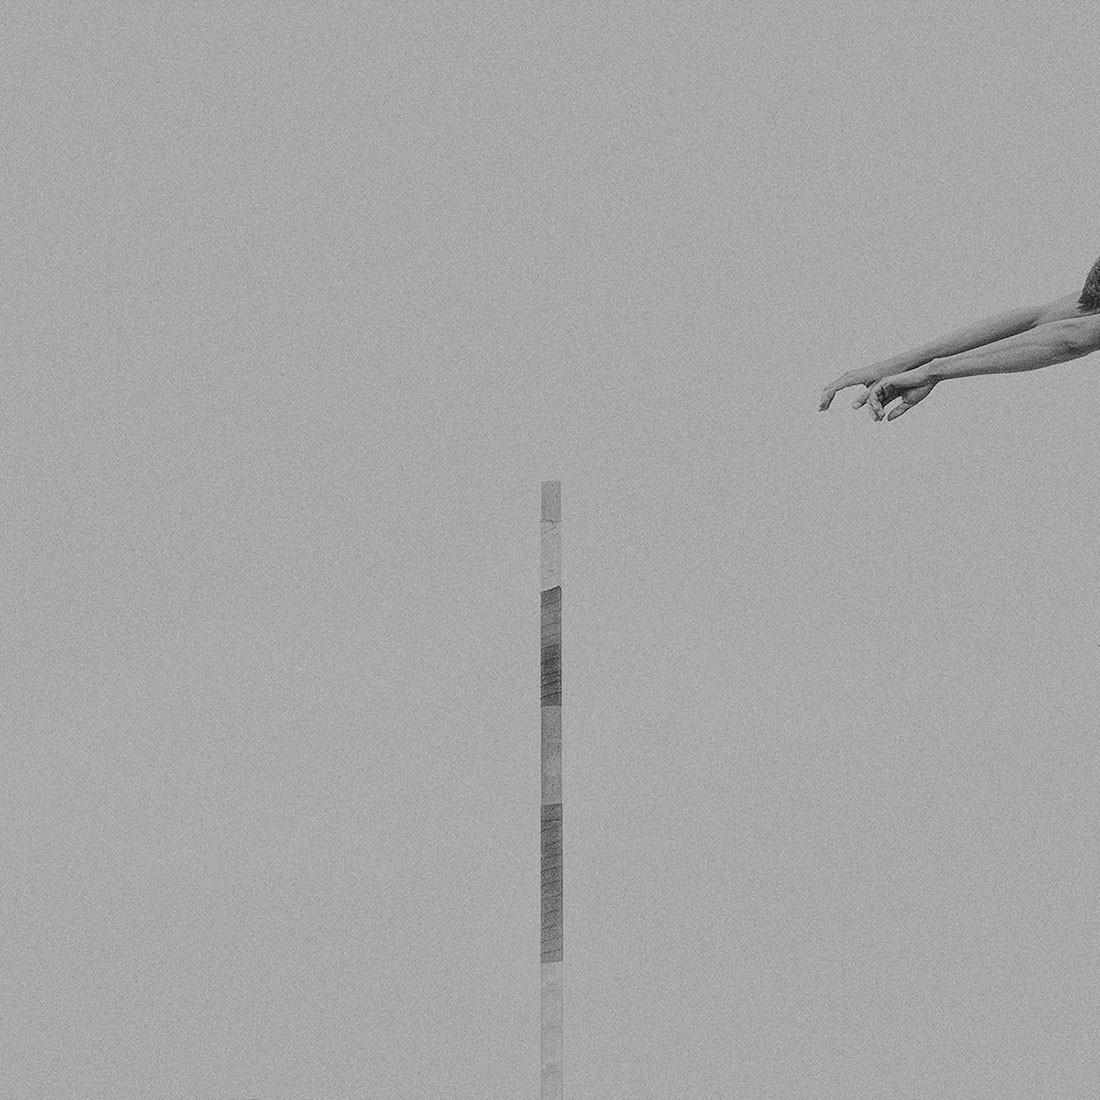 Minimalist Photographer Of The Year 2019. «Прыжок с шестом». Автор Клаус Ленцен